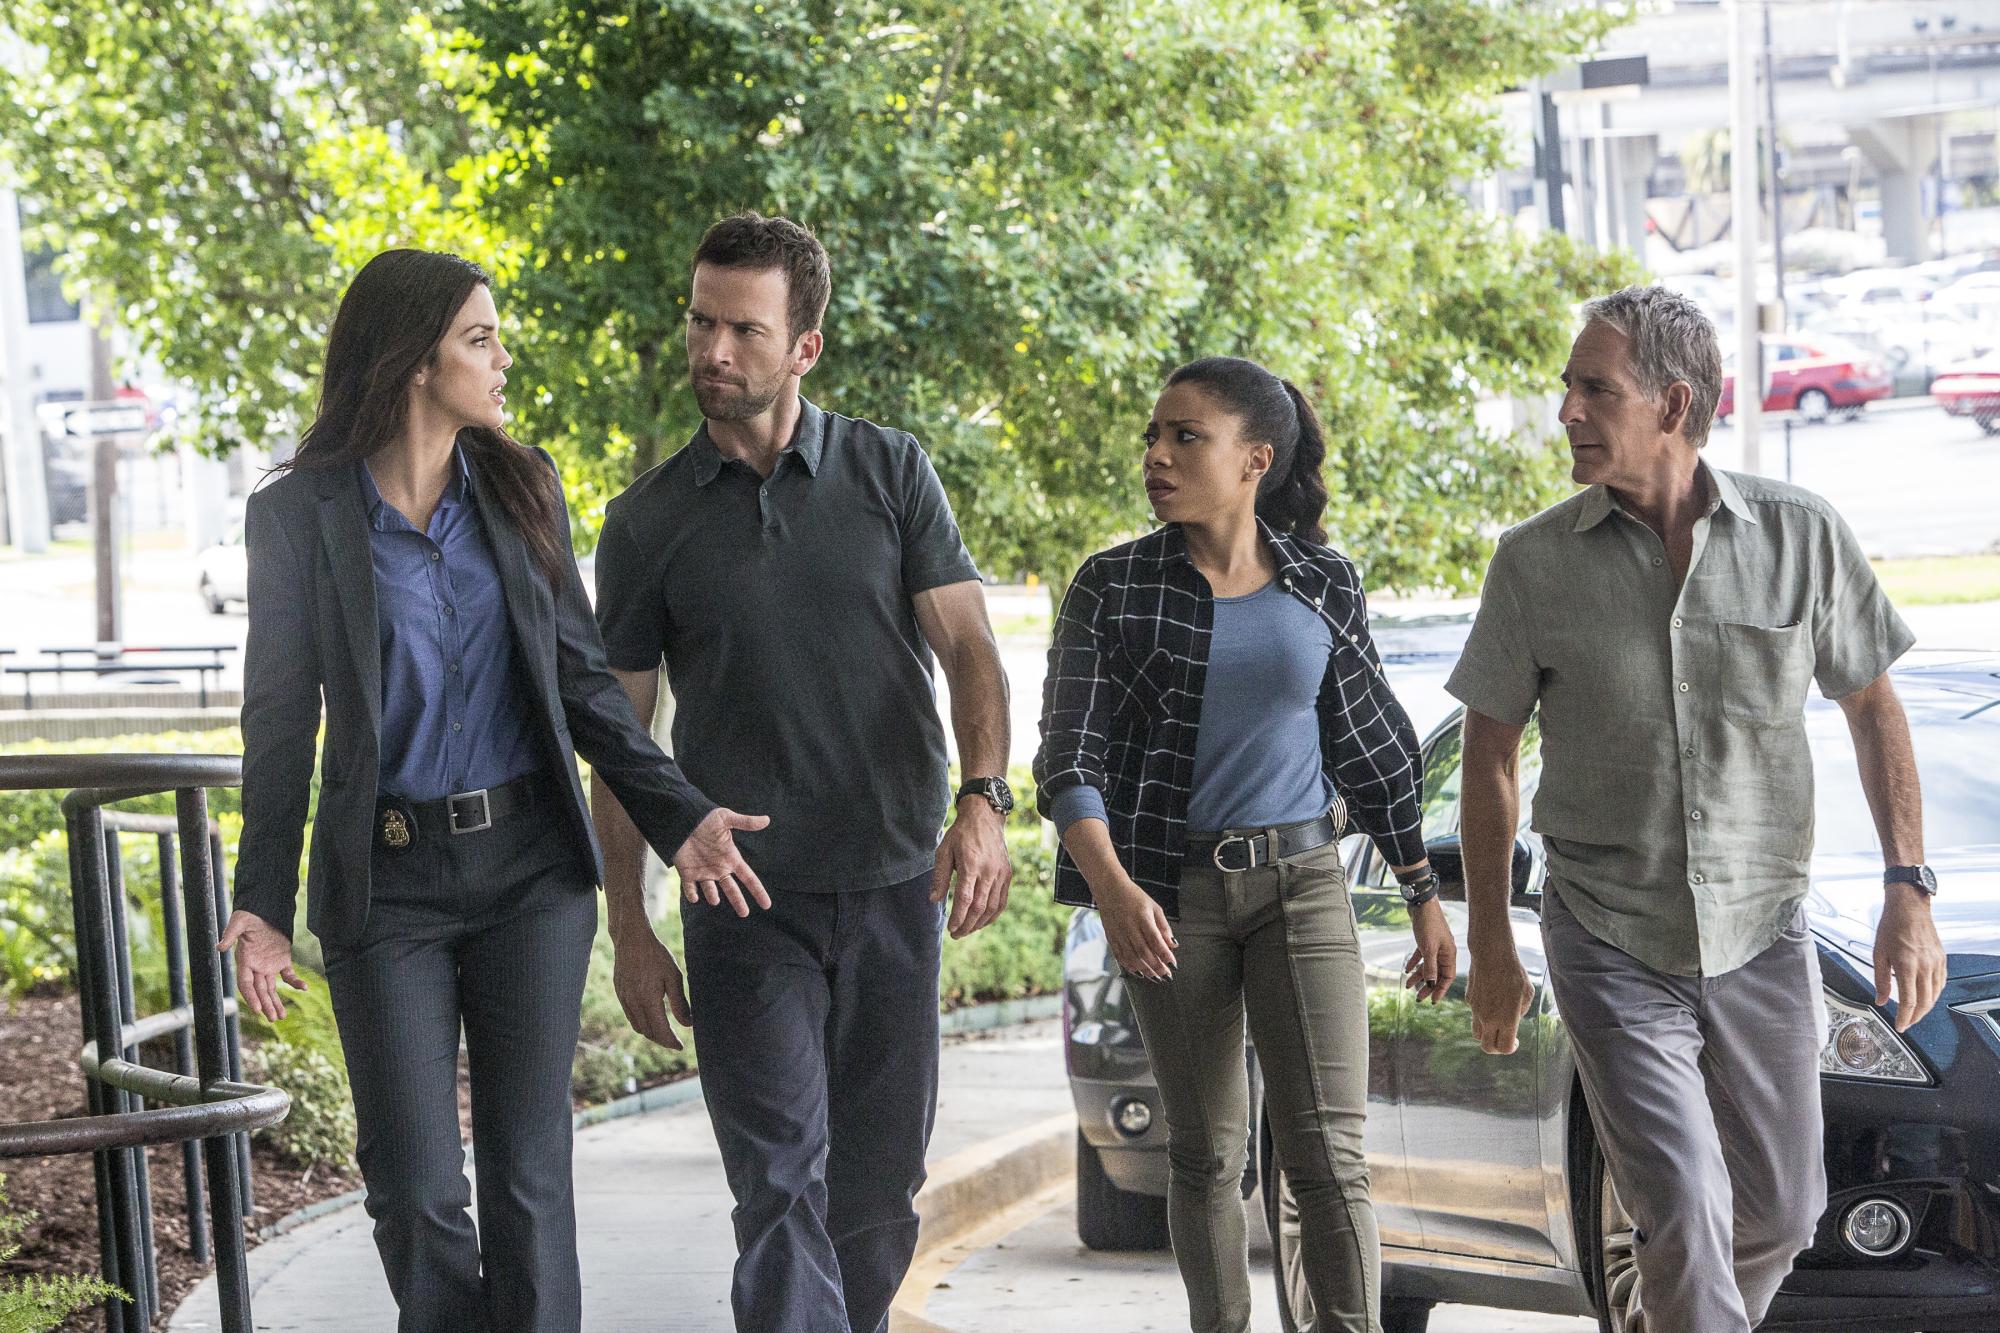 Vanessa Ferlito as FBI Special Agent Tammy Gregorio, Lucas Black as Special Agent Christopher Lasalle, Shalita Grant as Sonja Percy, and Scott Bakula as Special Agent Dwayne Pride